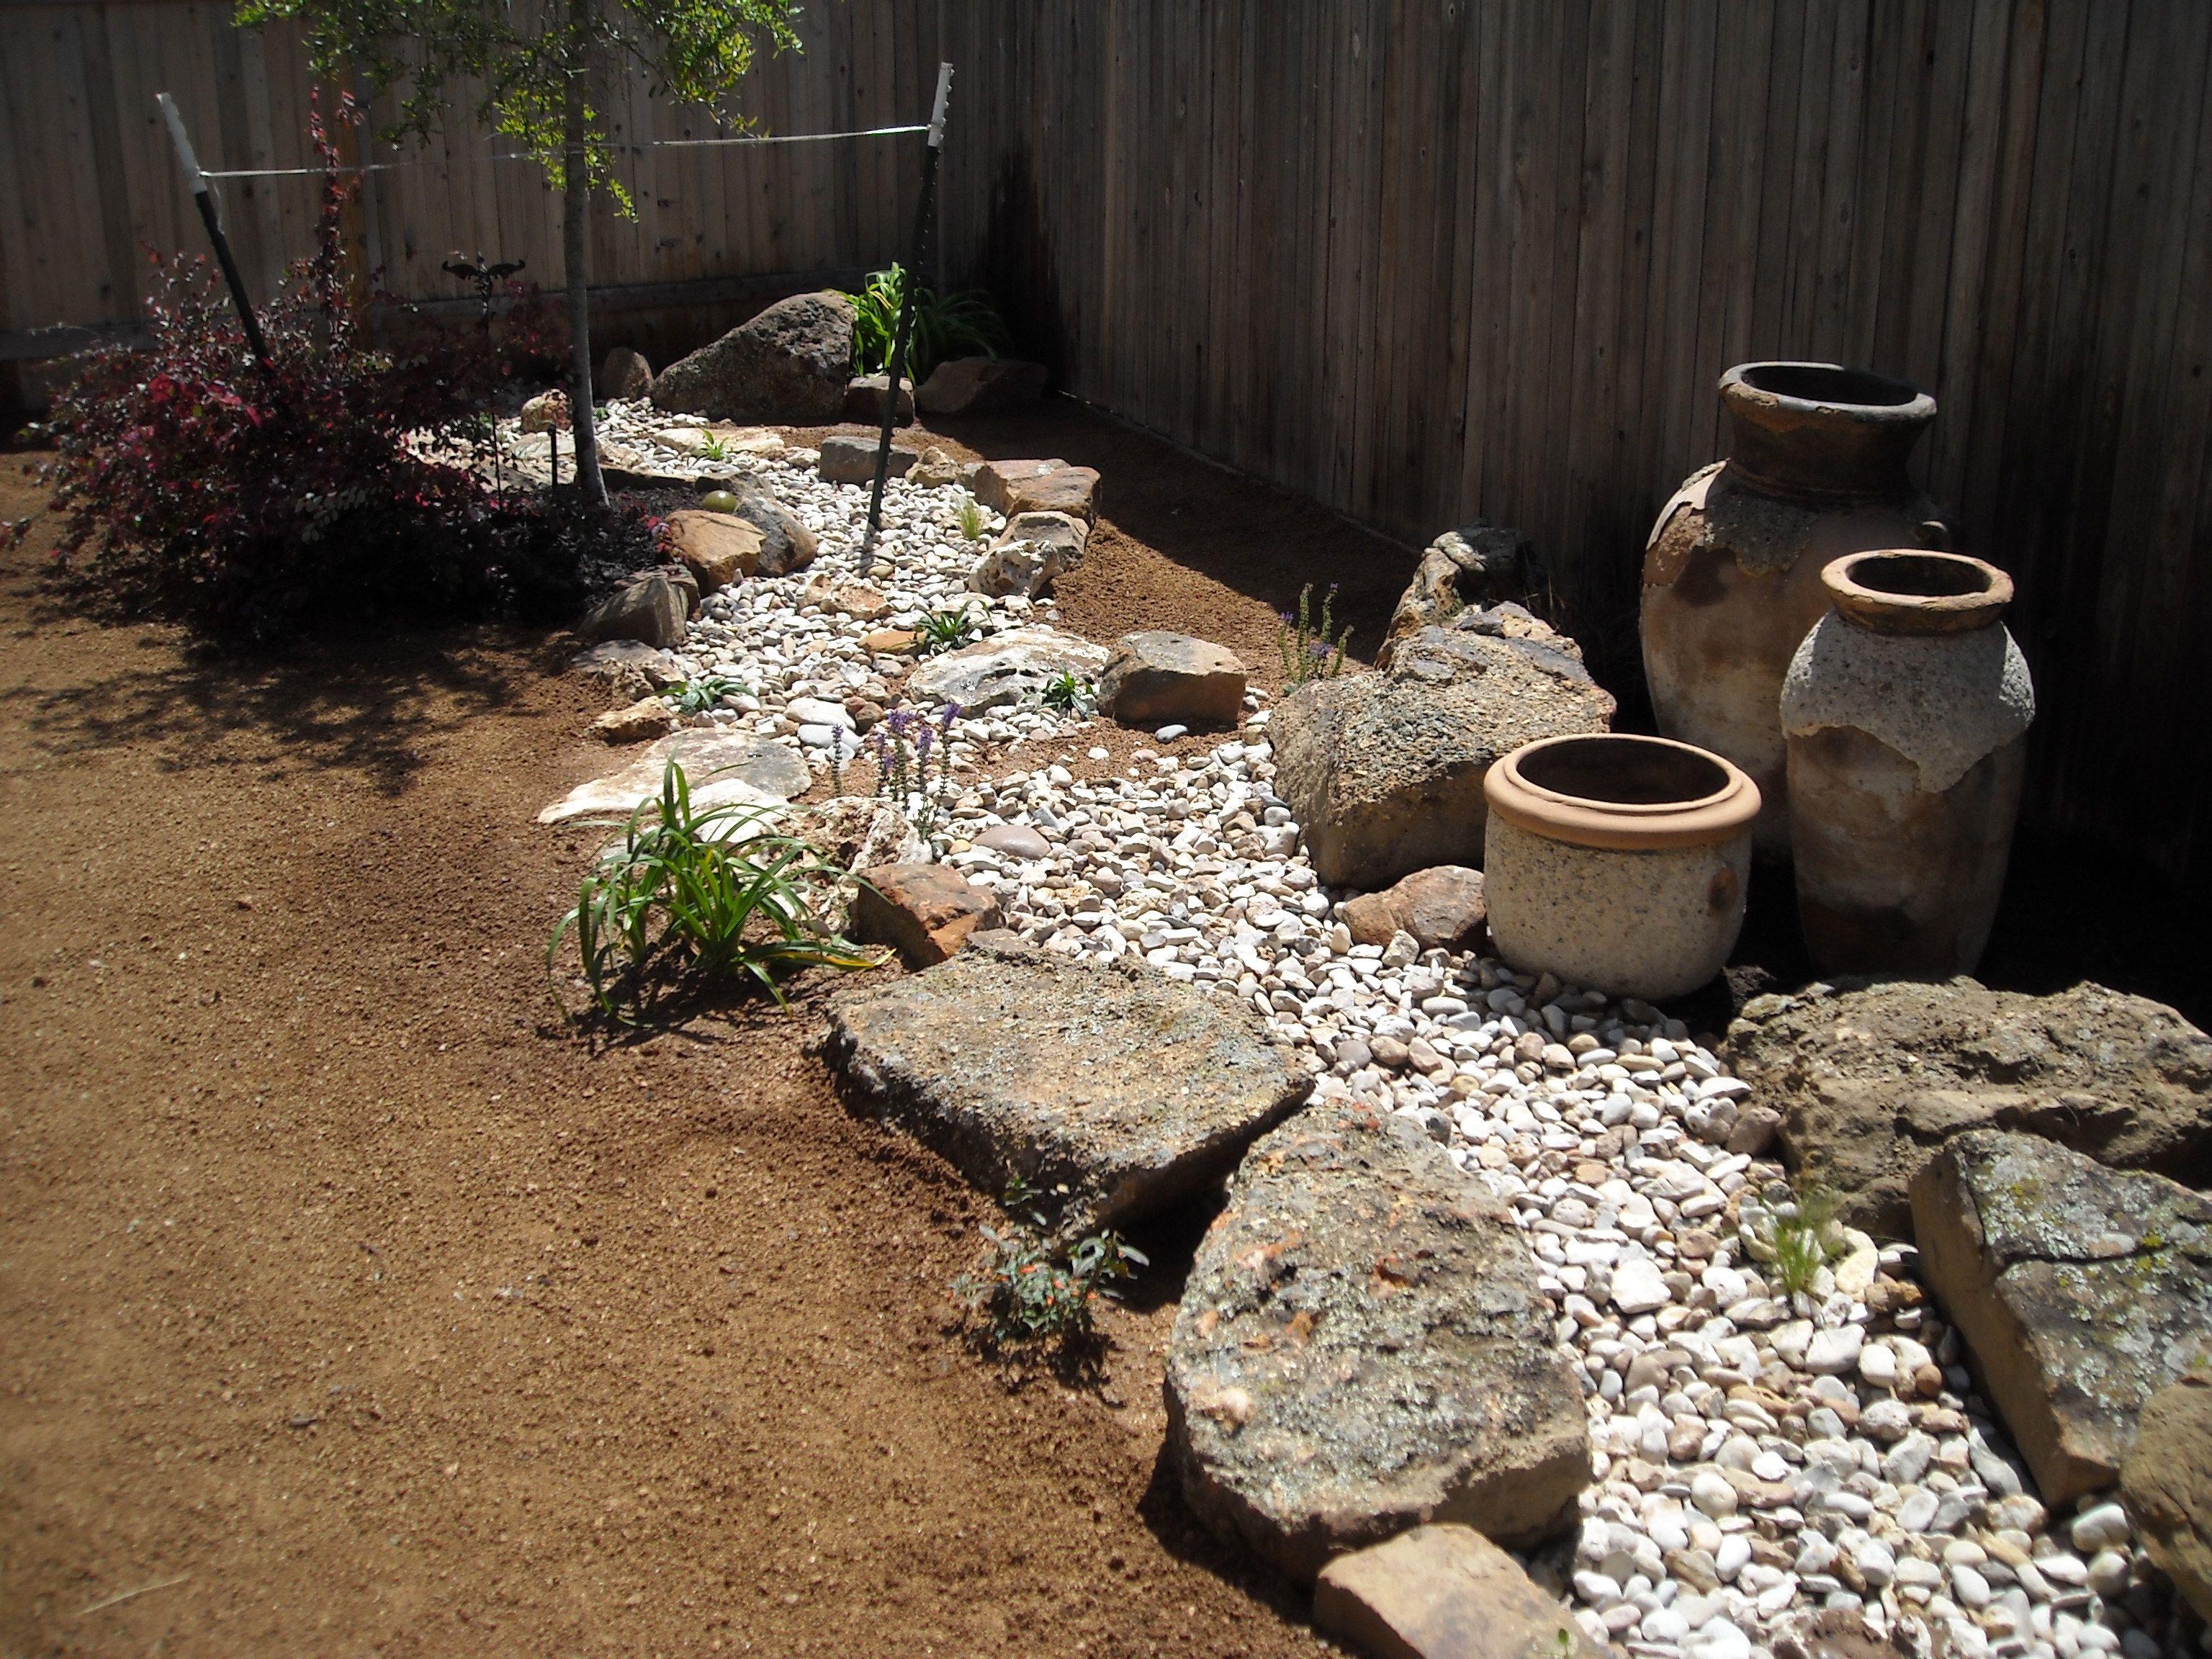 Planting succulents outdoors, designing a succulent garden ... |Rock Garden With Pots